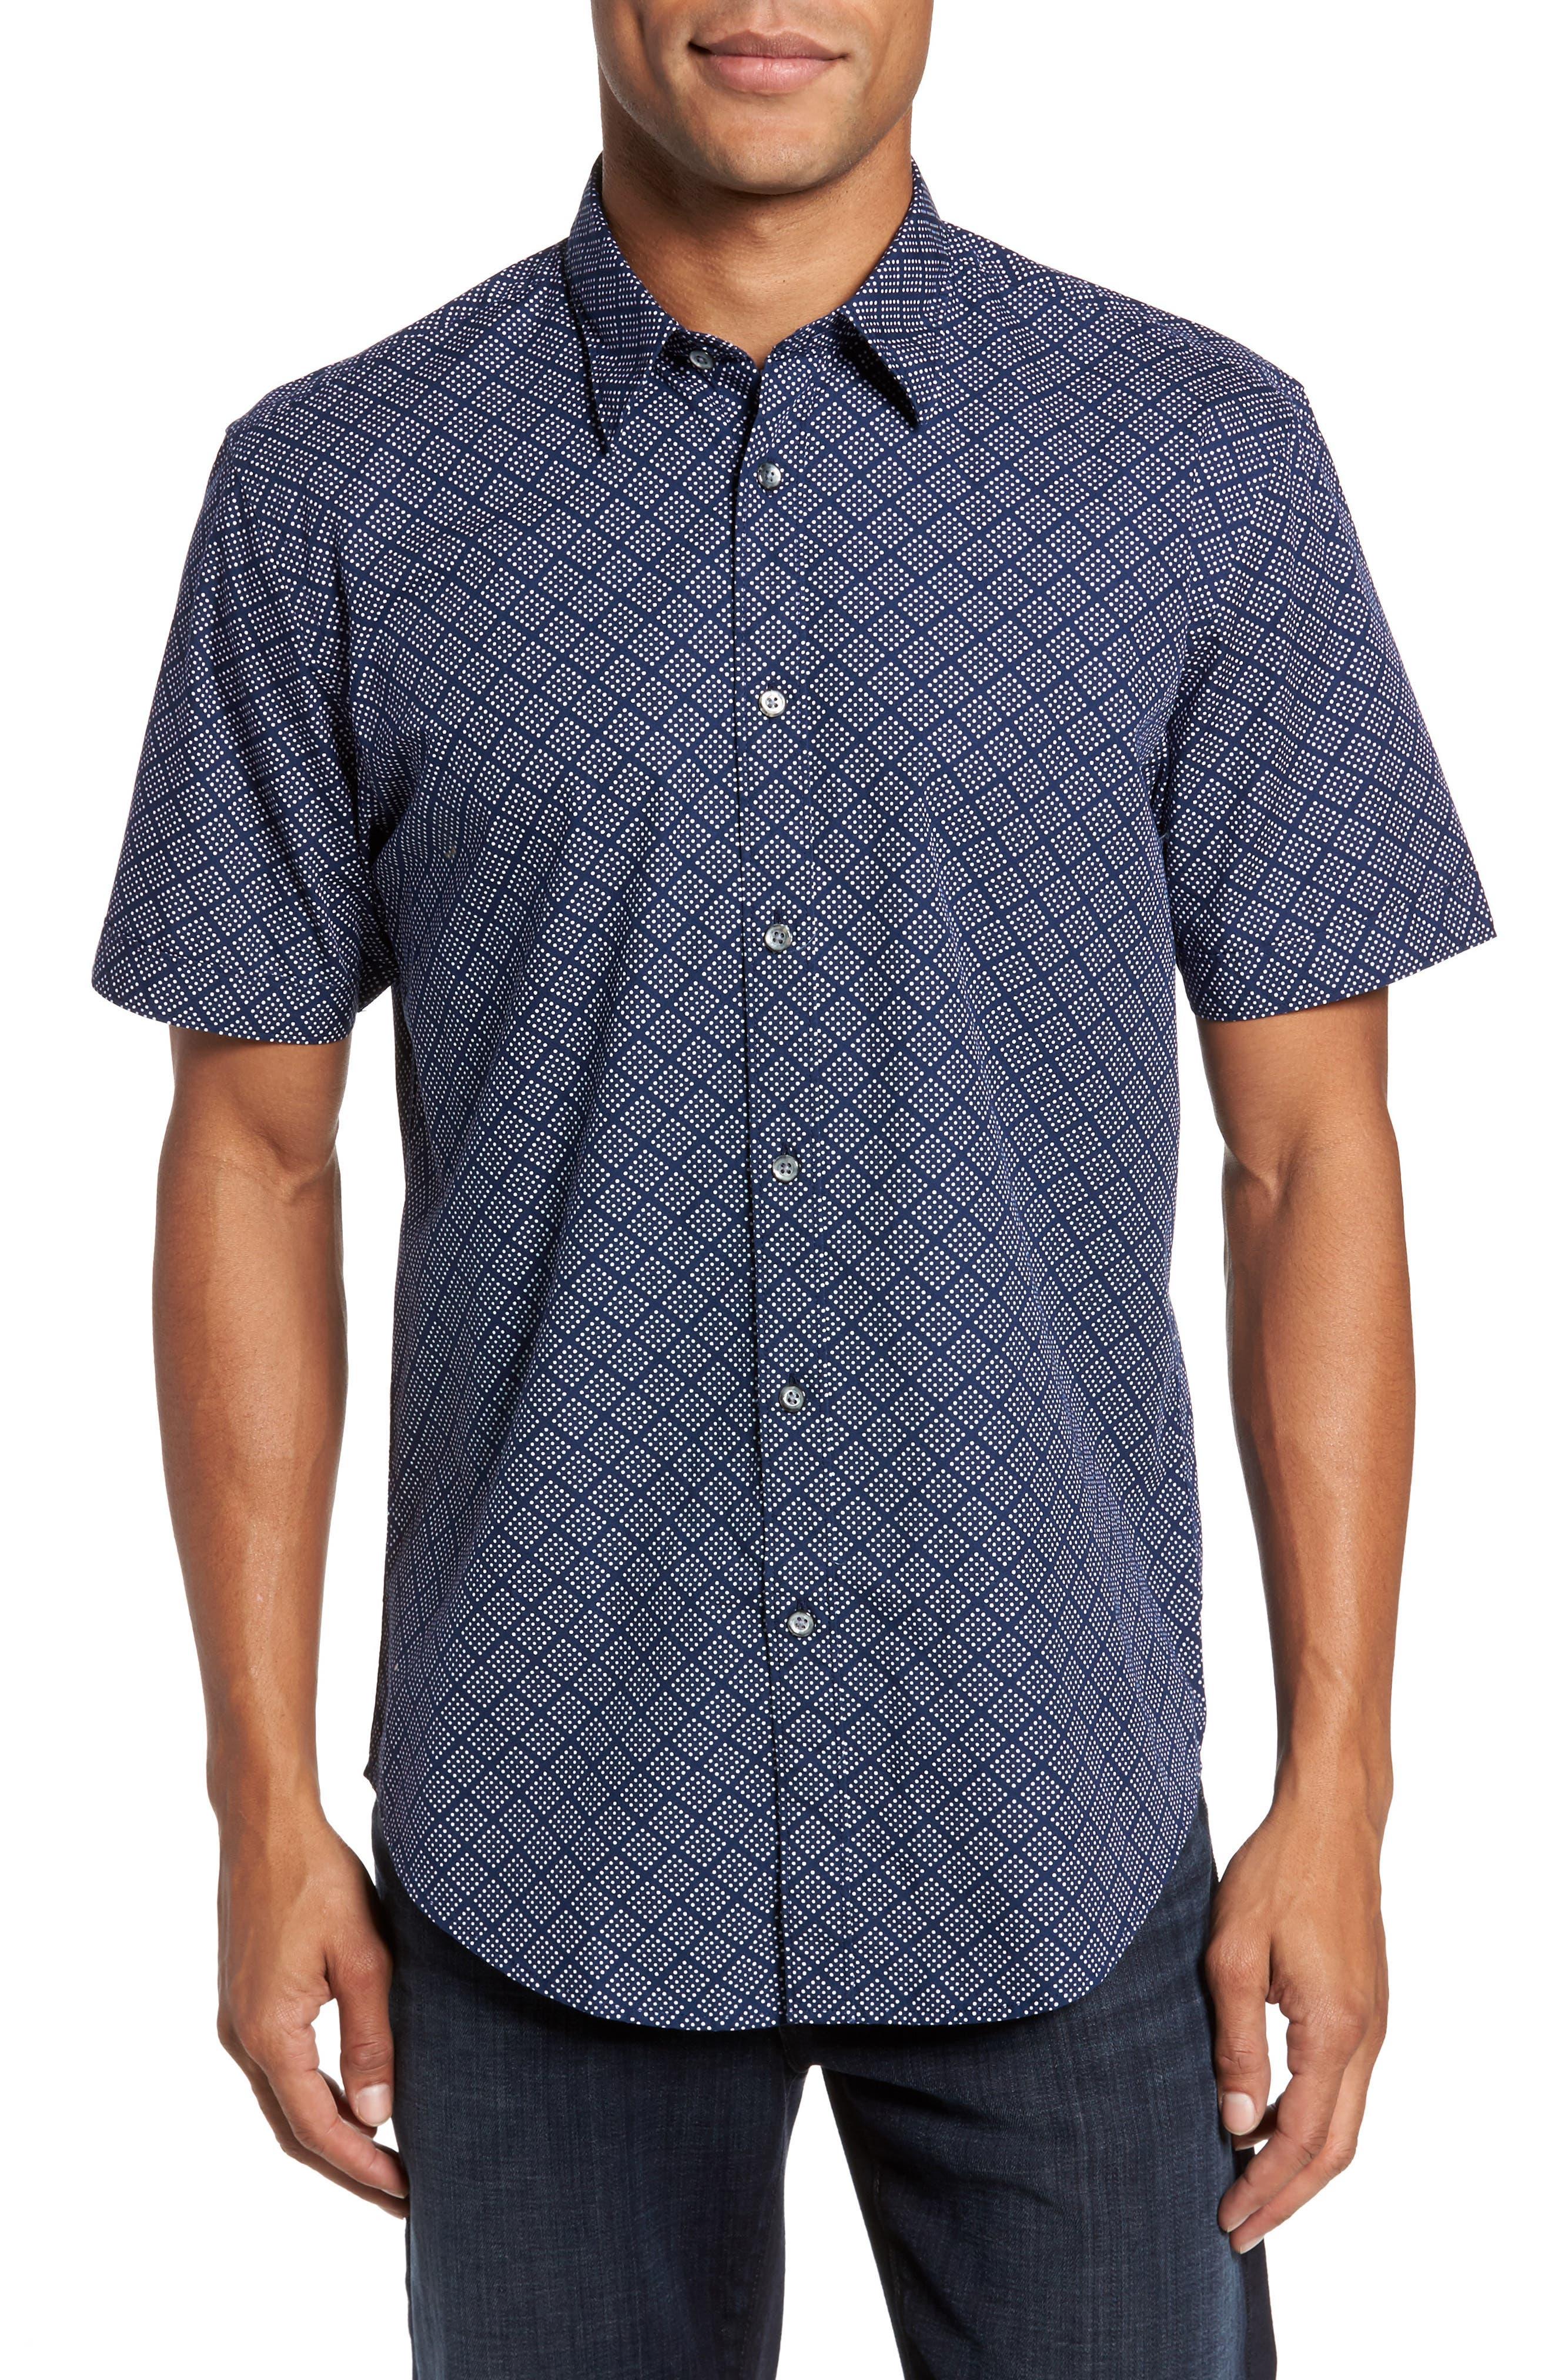 Coastaoro Diamo Regular Fit Dot Print Sport Shirt